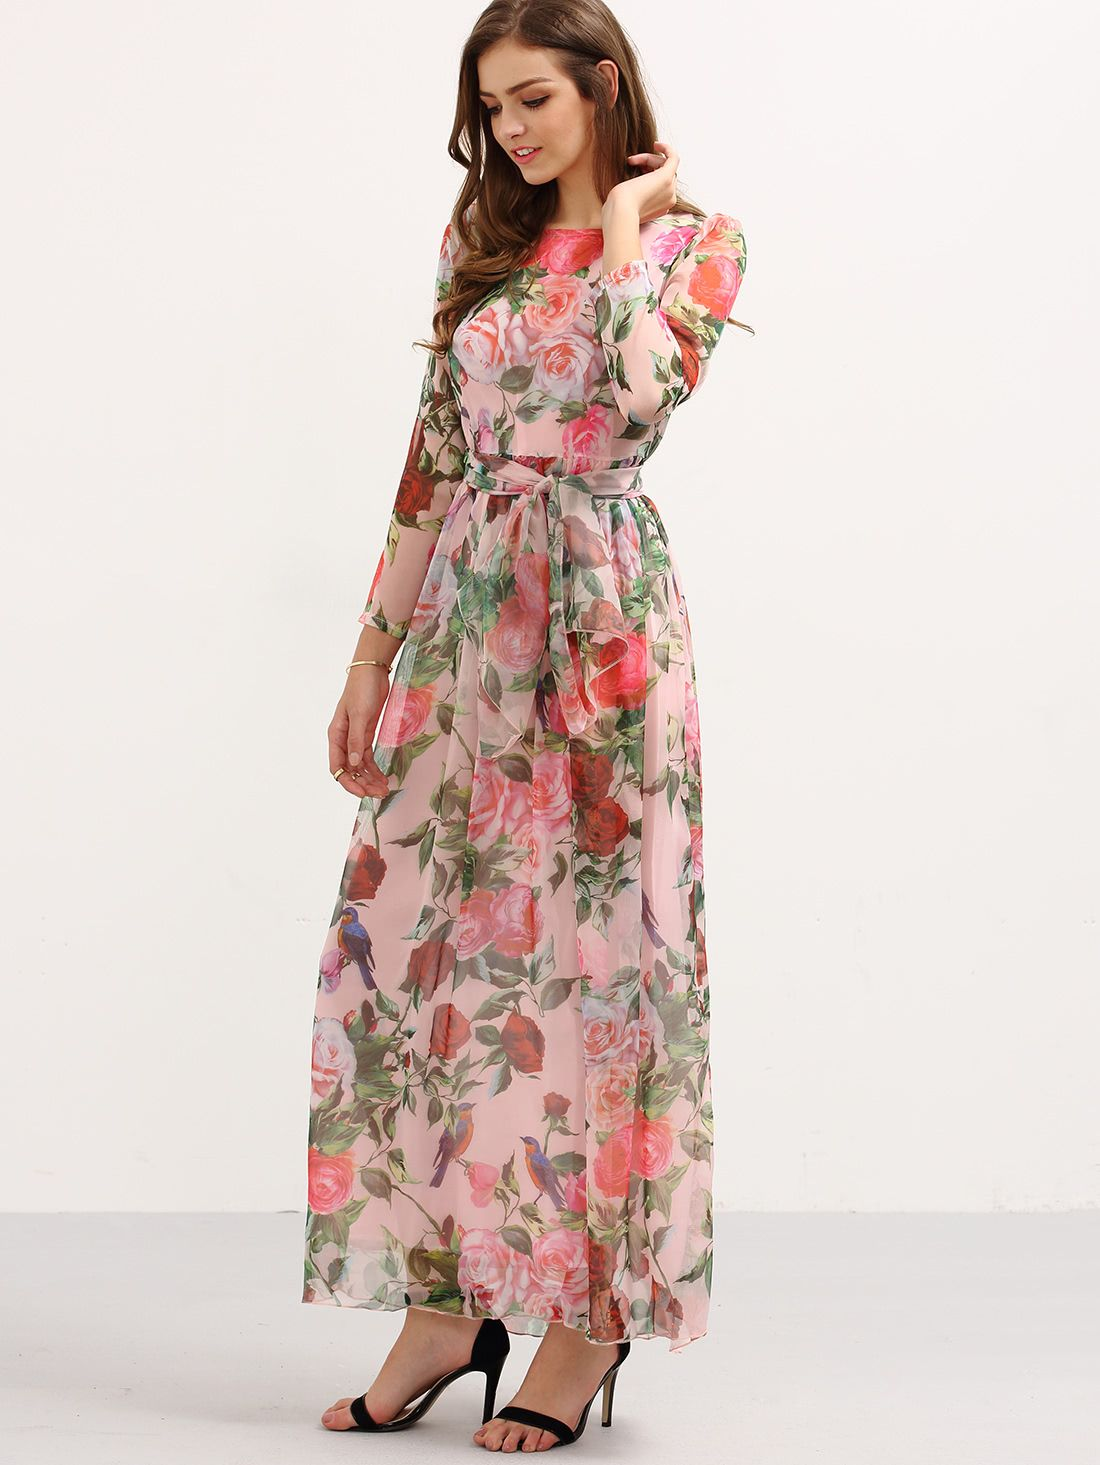 Pin by vania lisboa on shop pinterest long sleeve chiffon dress